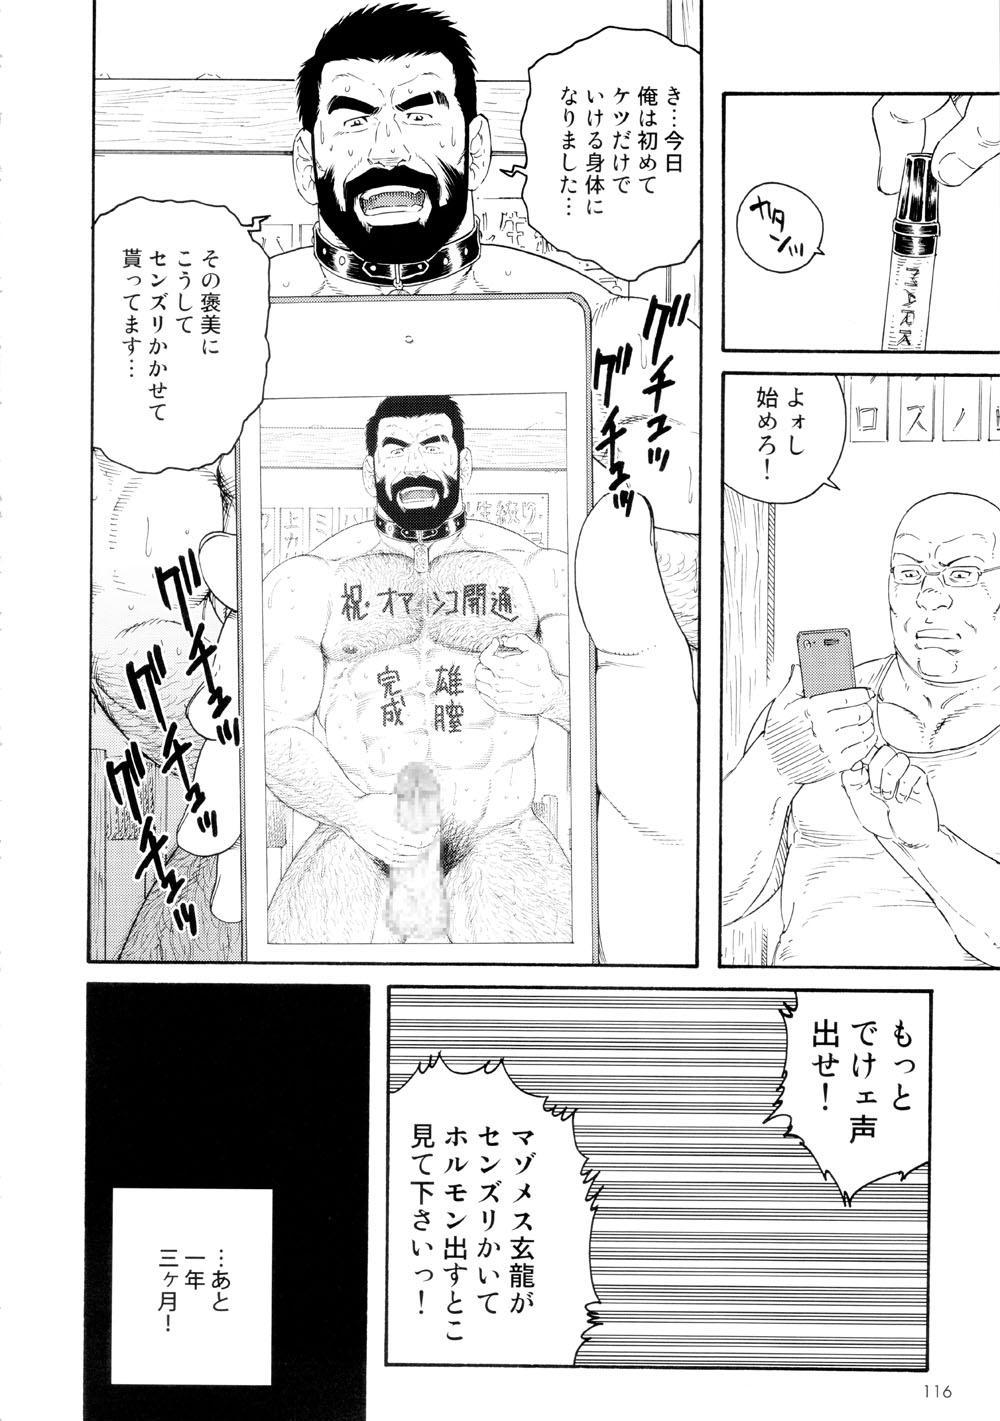 Genryu Chapter 3 9